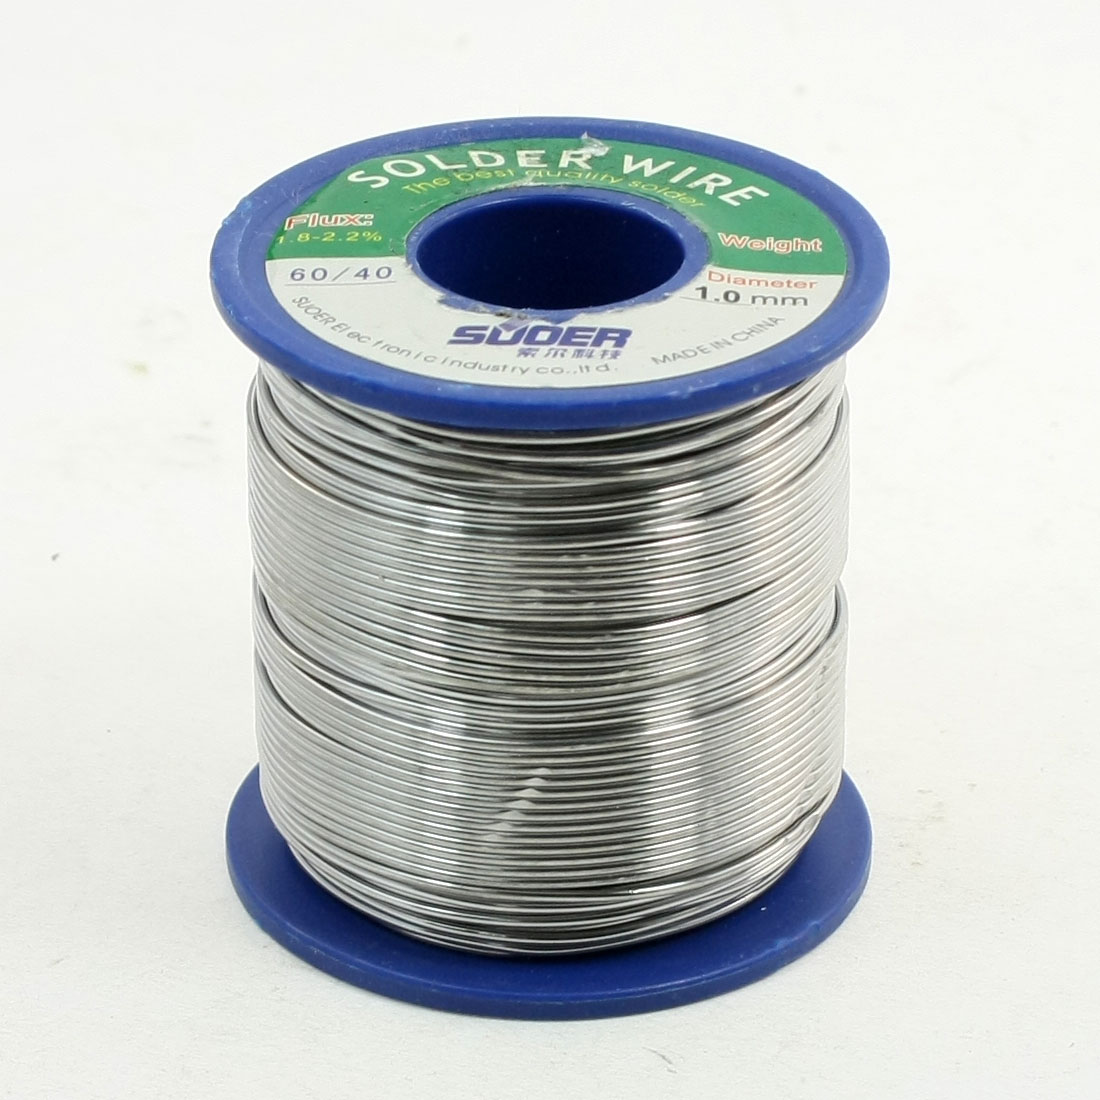 1.0mm 400g 60/40 Rosin Core Flux 1.8-2.2% Tin Lead Roll Soldering Solder Wire